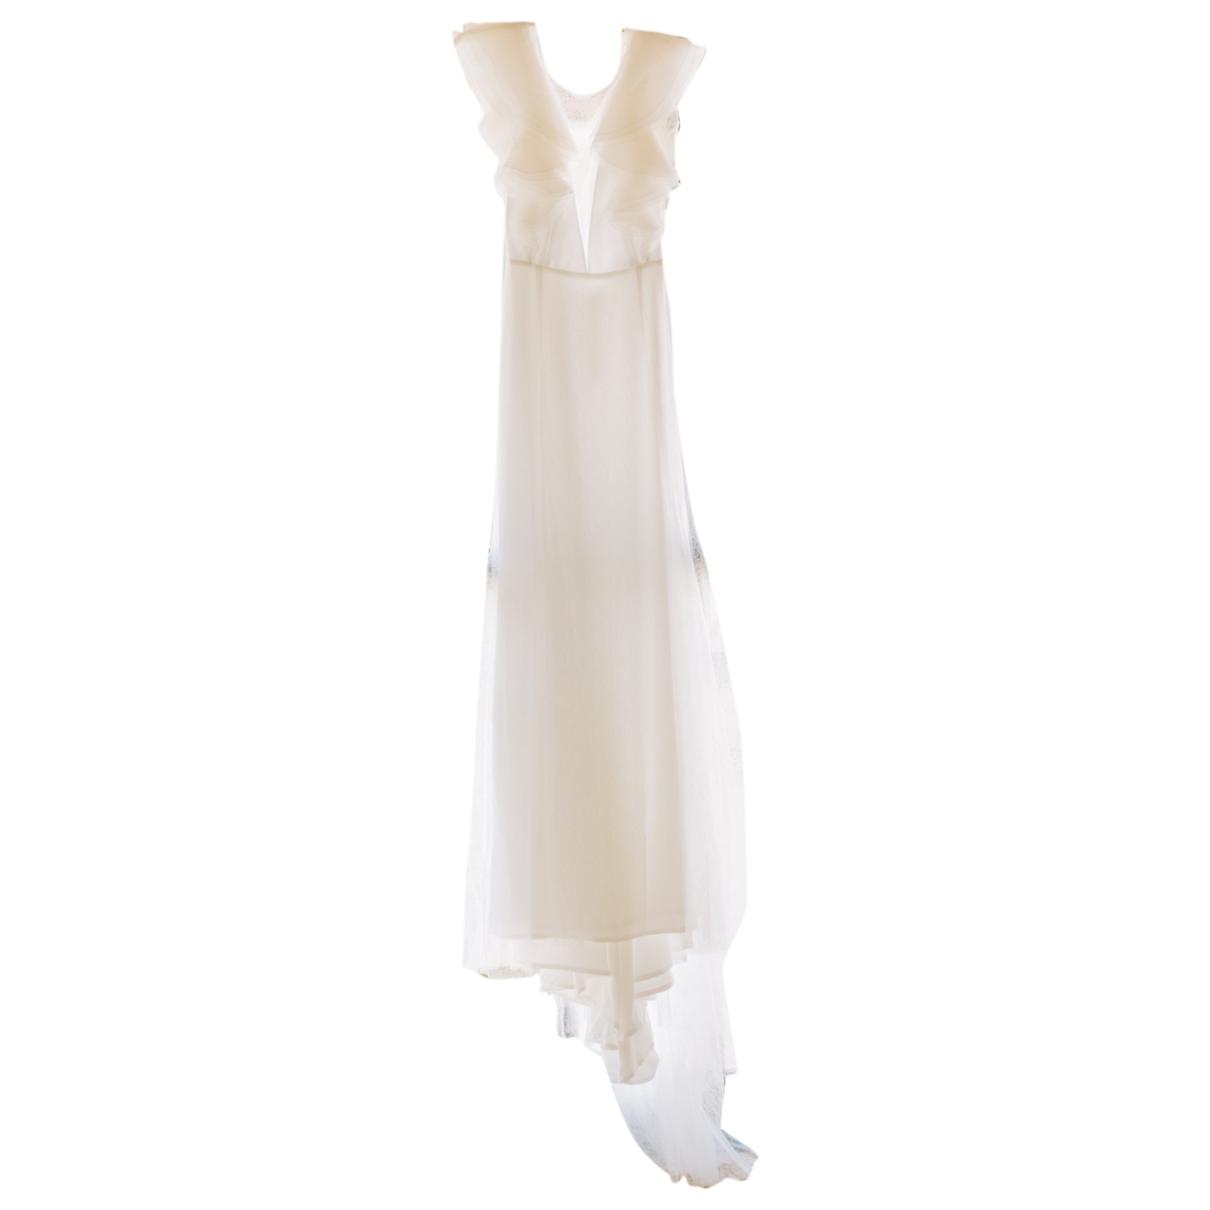 Rime Arodaky - Robe   pour femme en soie - blanc